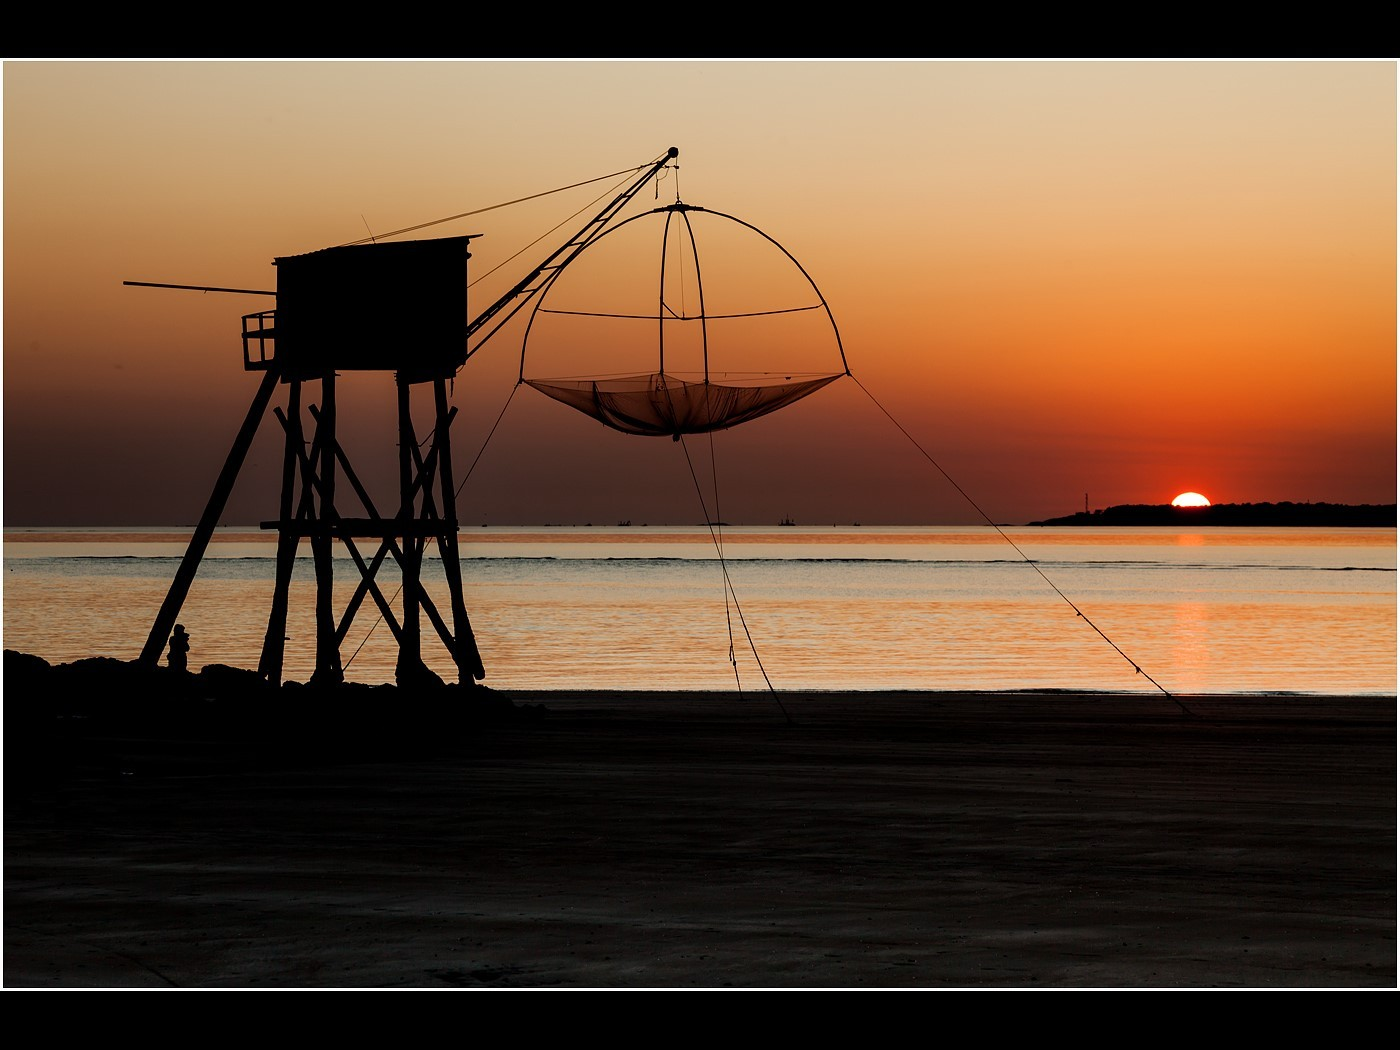 Sunset on the Fishing Hut